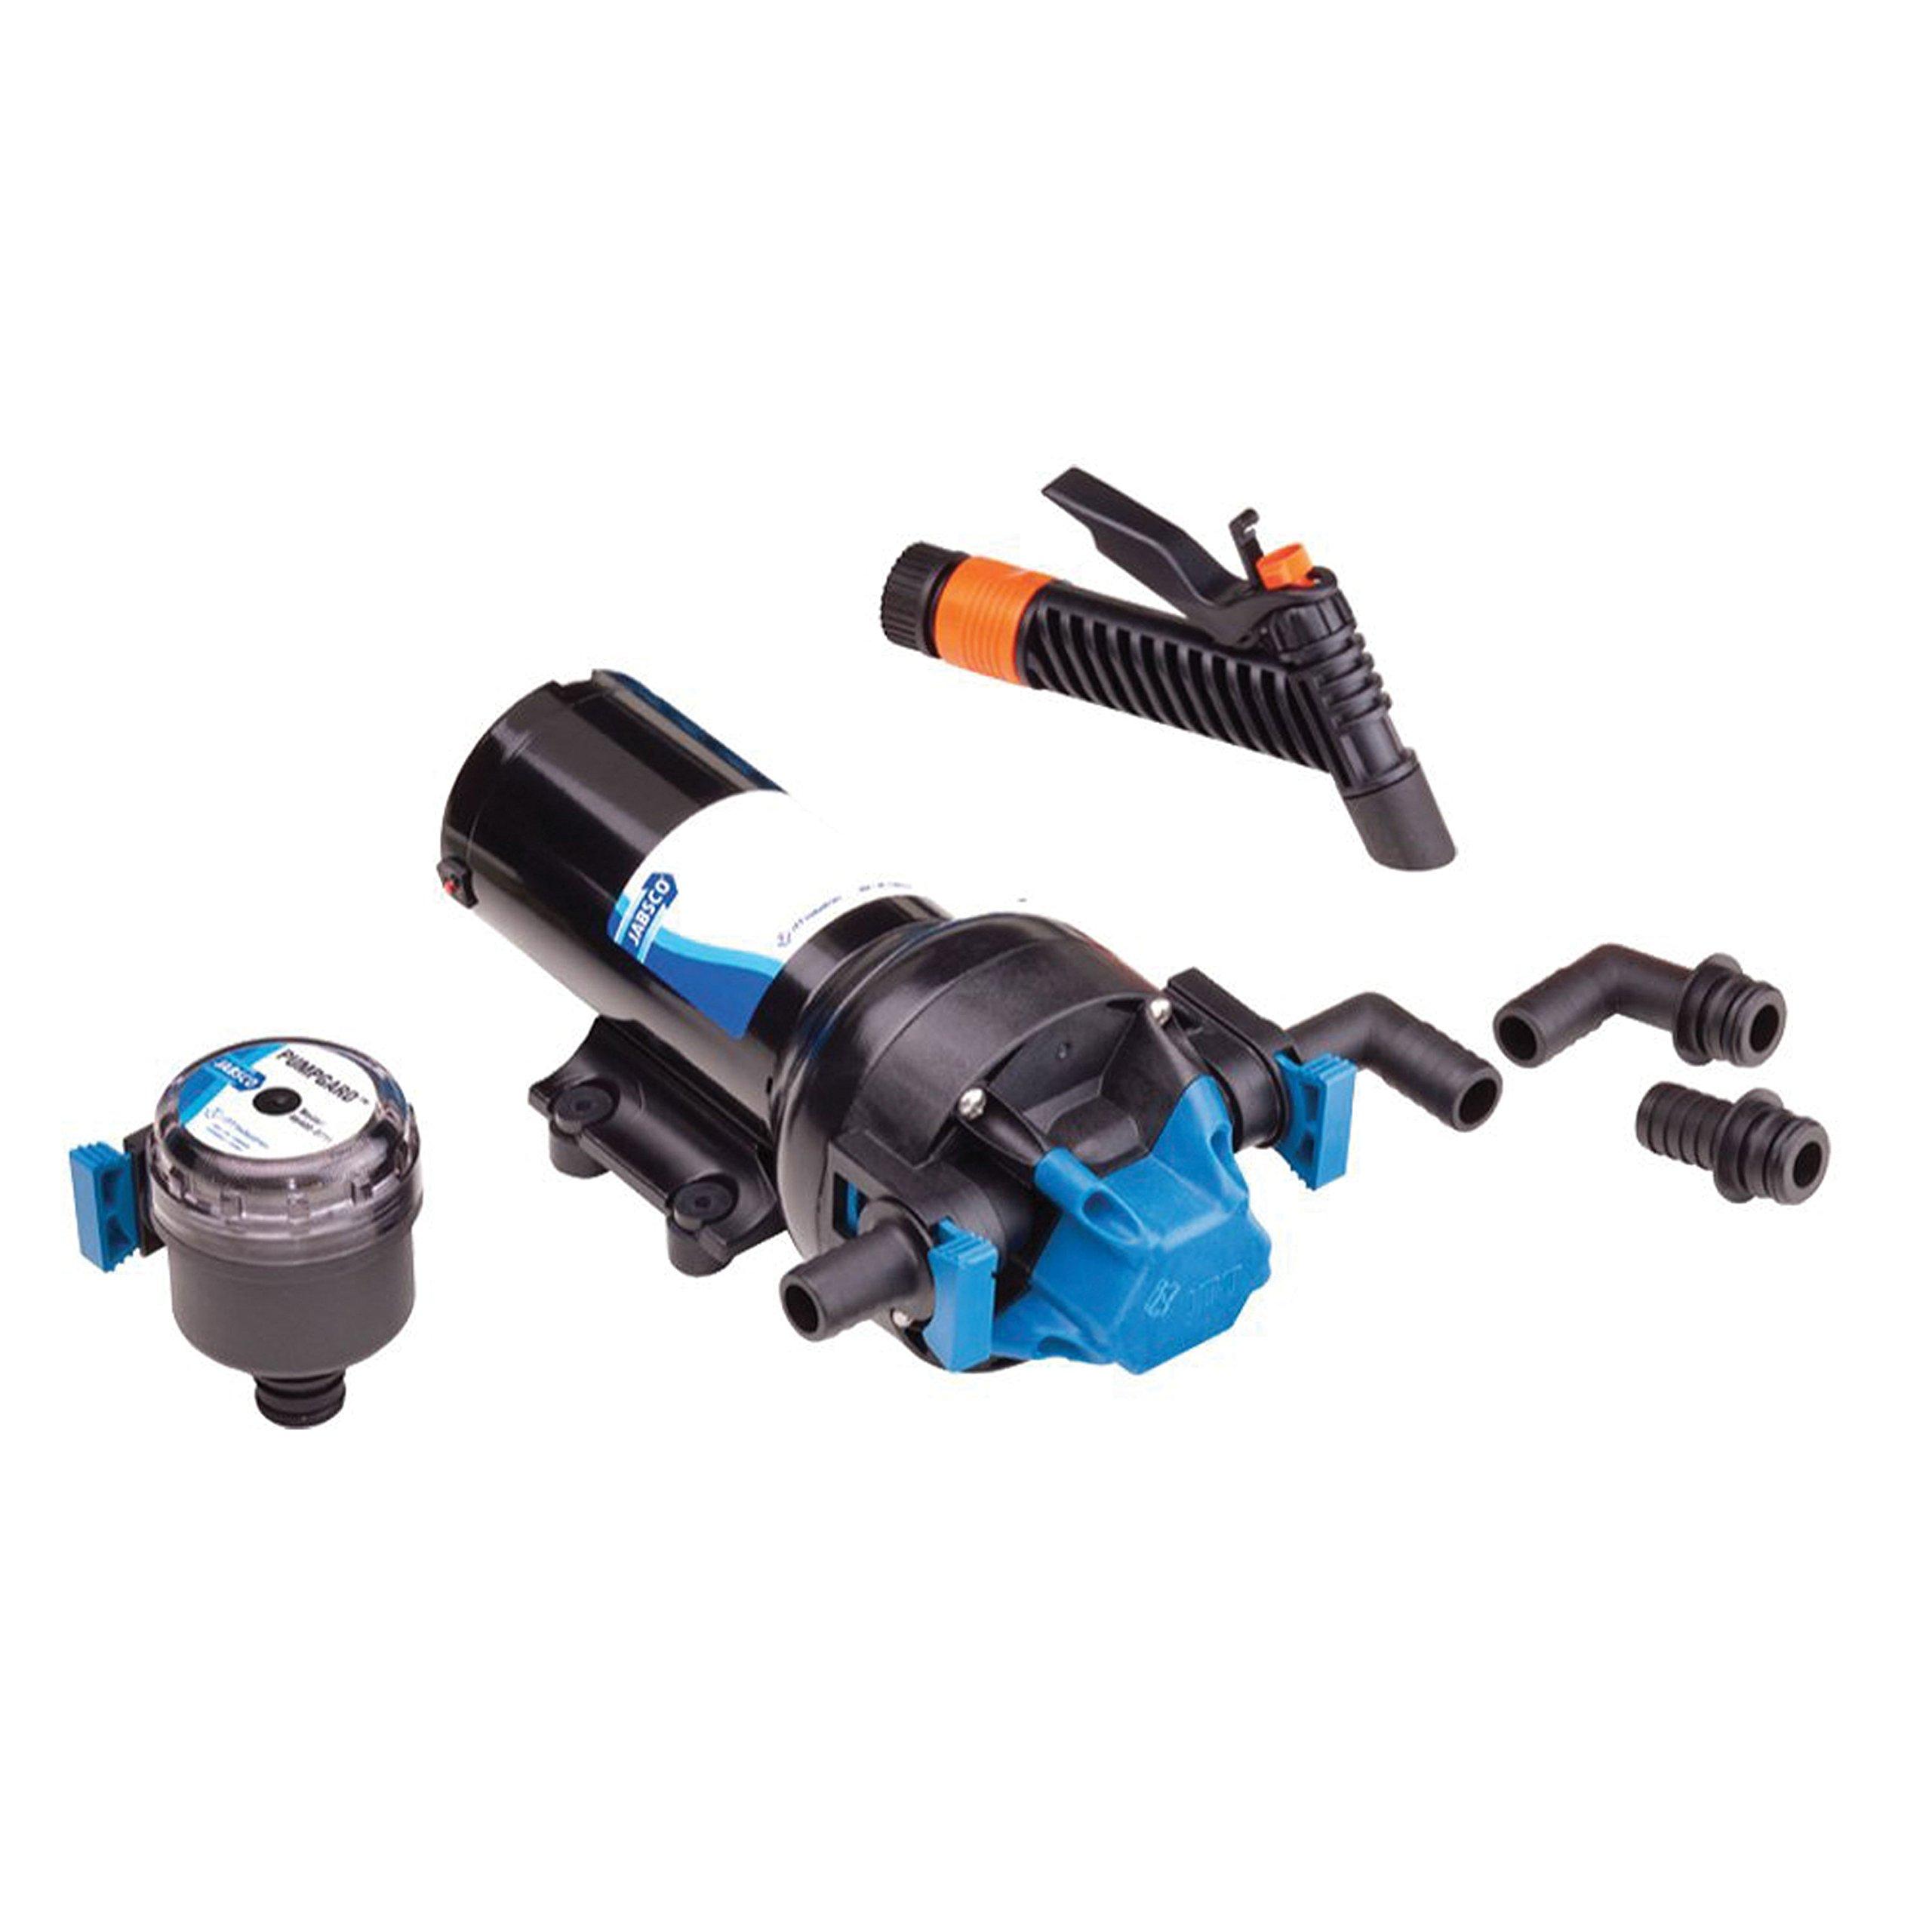 Jabsco 82505-0092 Hot Shot 5.0 5GPH Washdown Pump by Jabsco